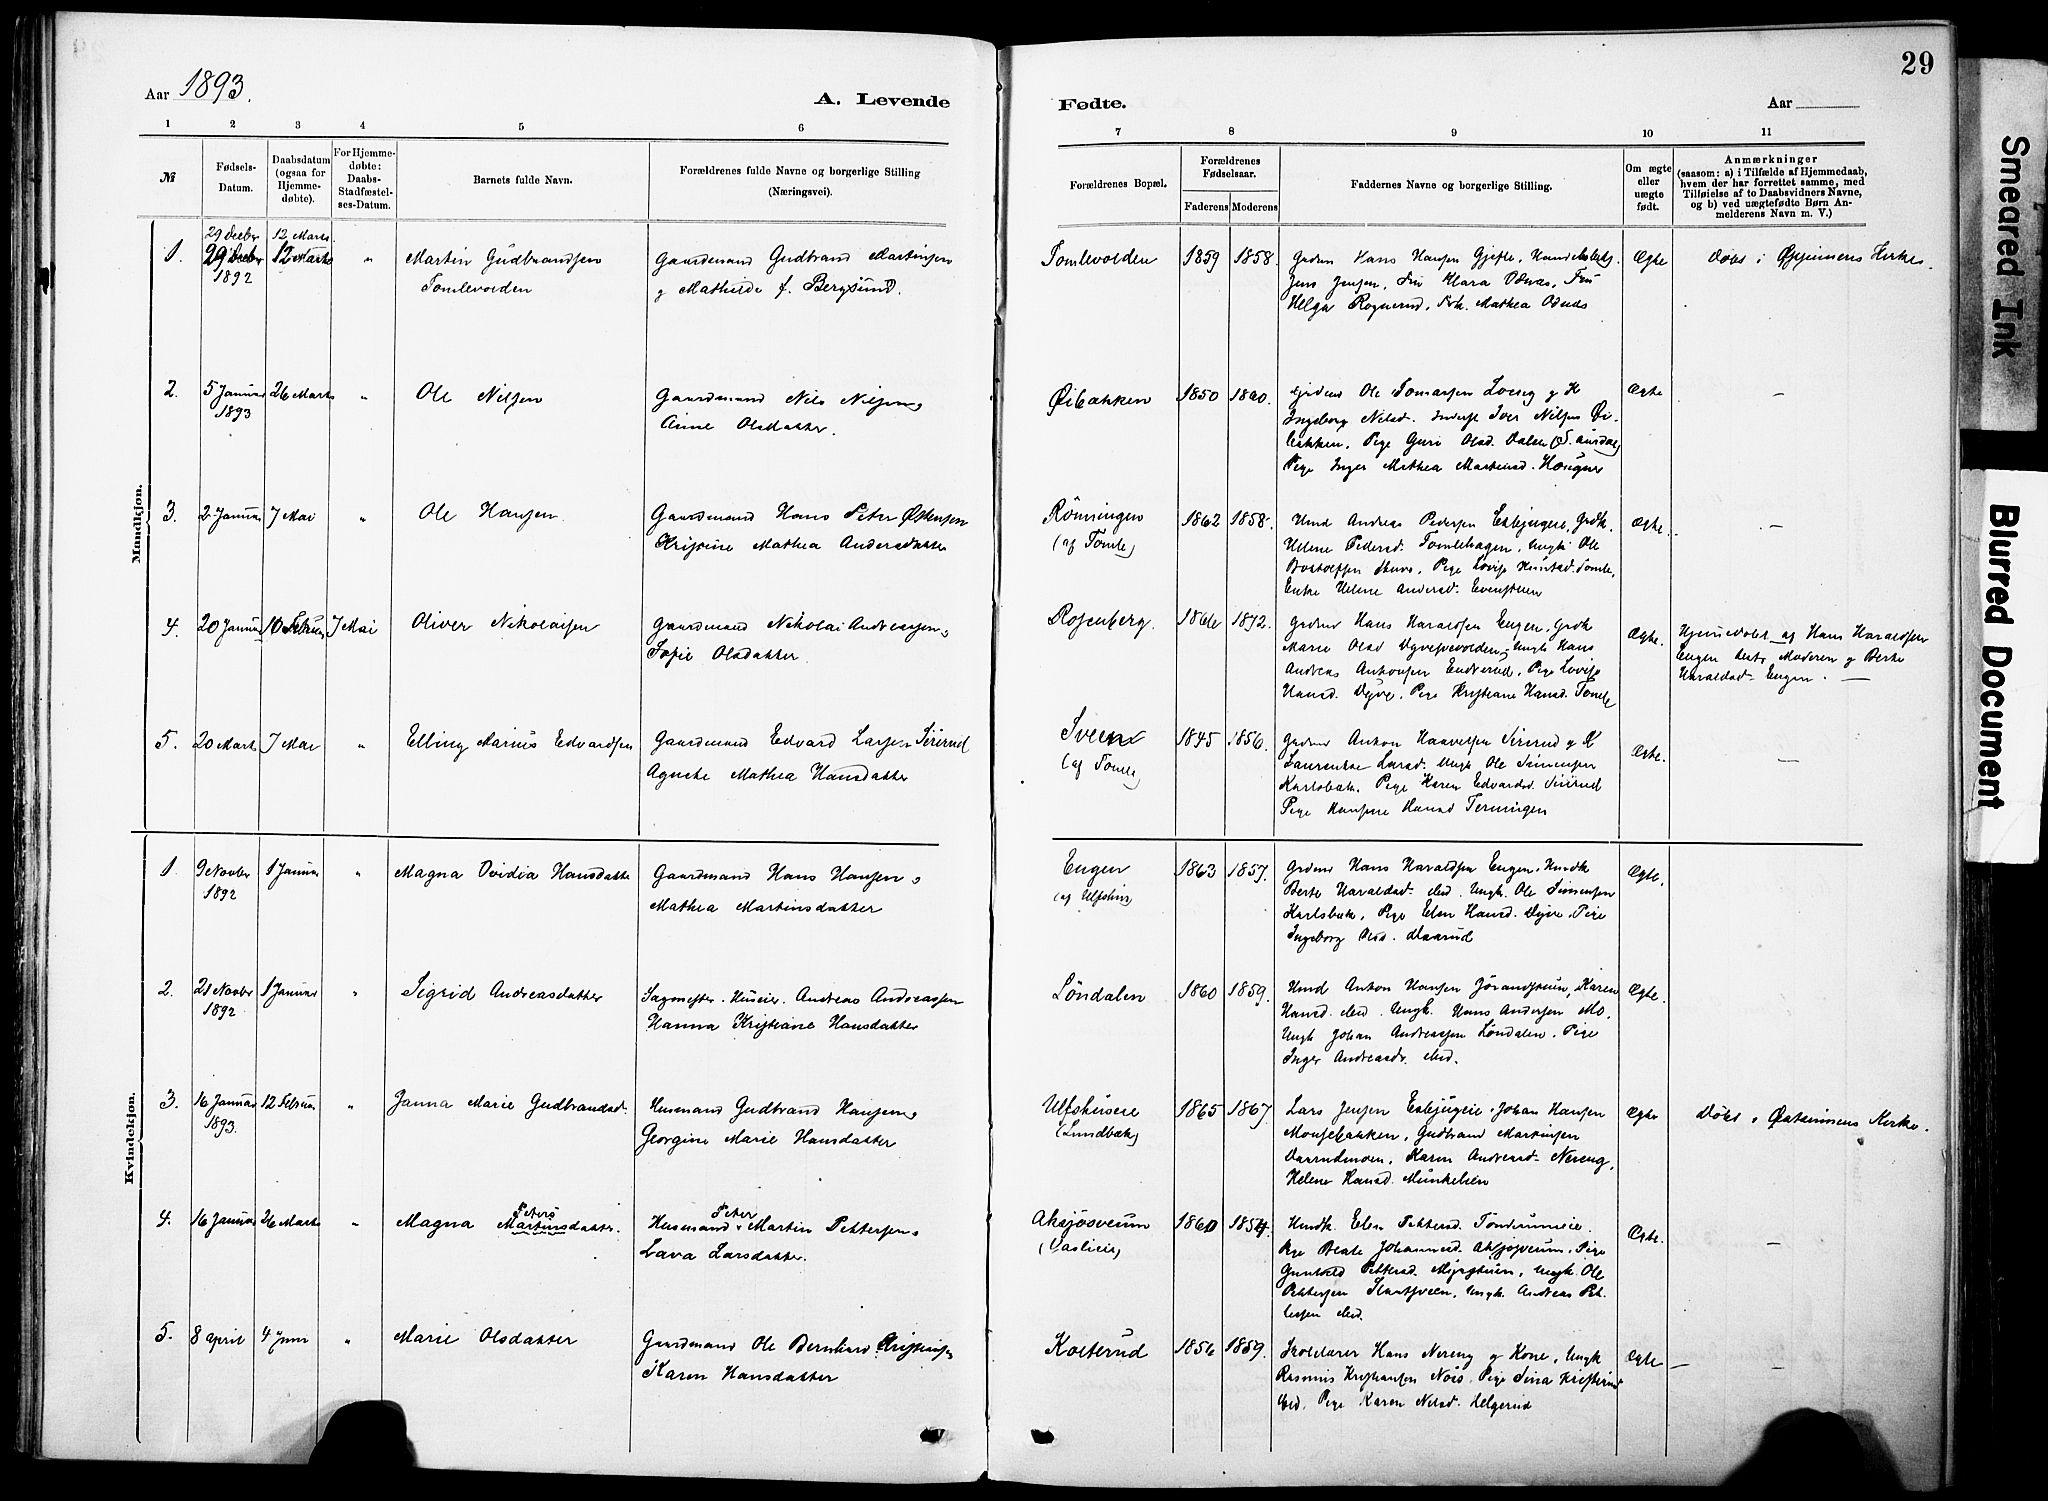 SAH, Nordre Land prestekontor, Ministerialbok nr. 5, 1882-1903, s. 29